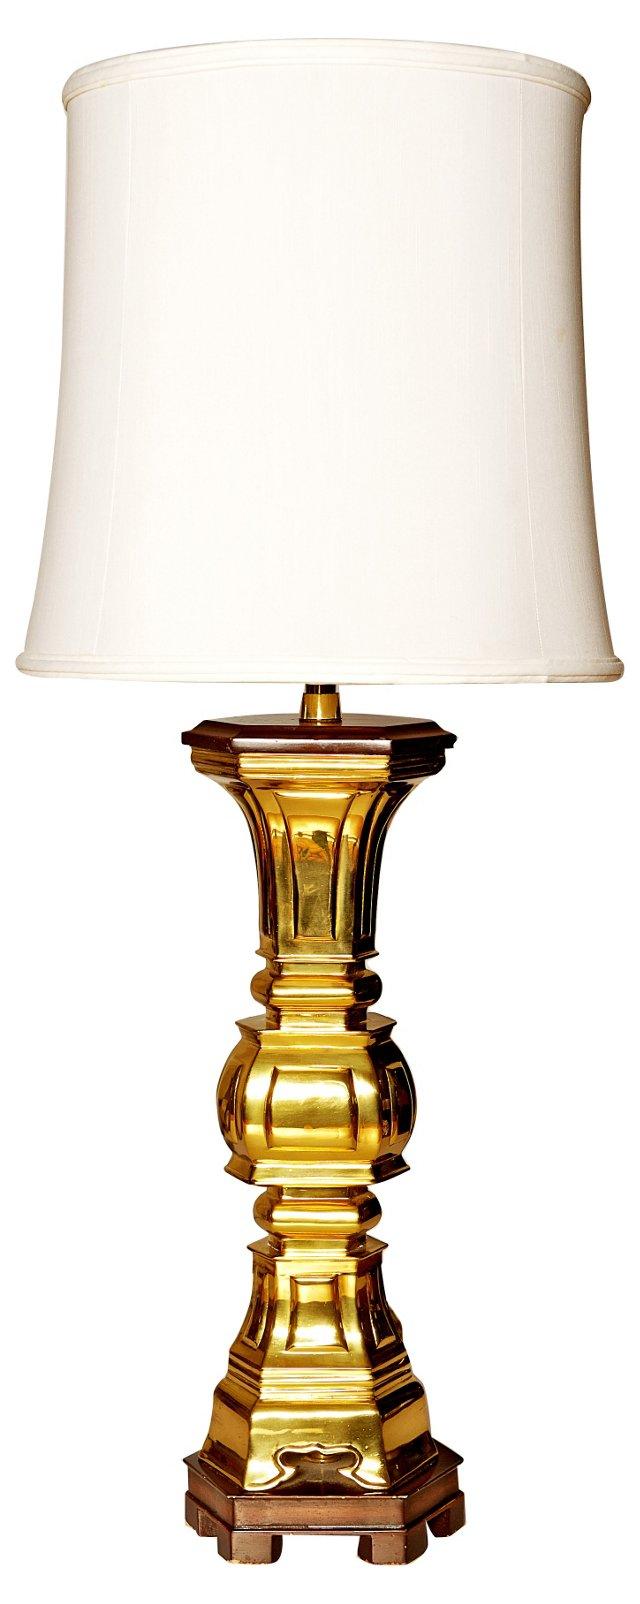 Italian Brass Lamp by Marbro